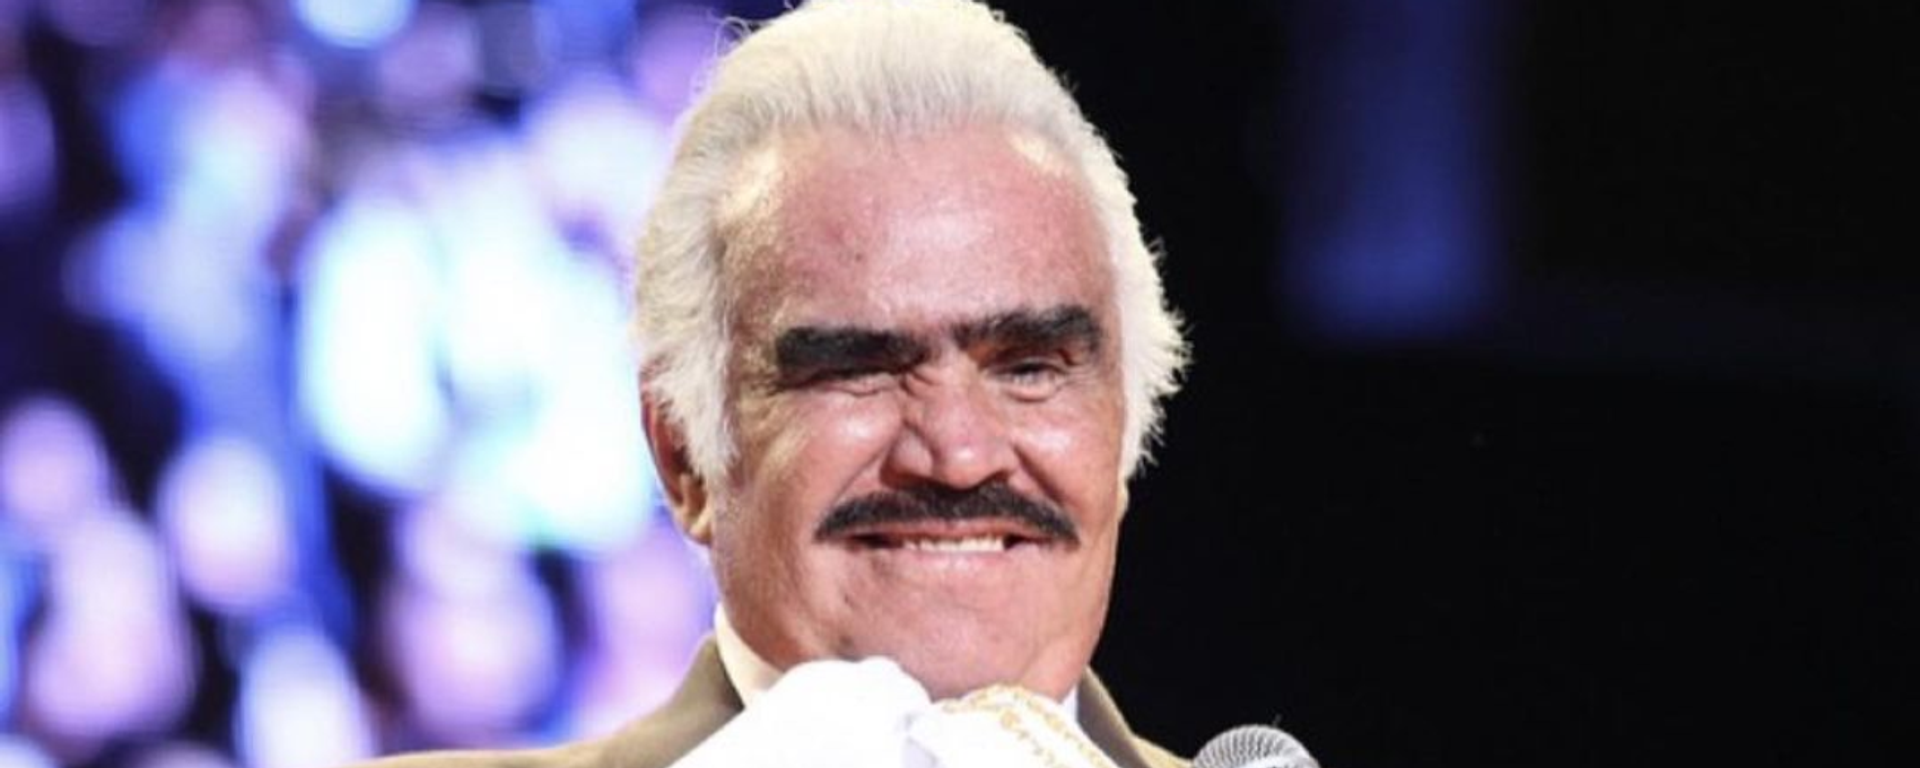 Vicente Fernández, cantante mexicano - Sputnik Mundo, 1920, 03.09.2021